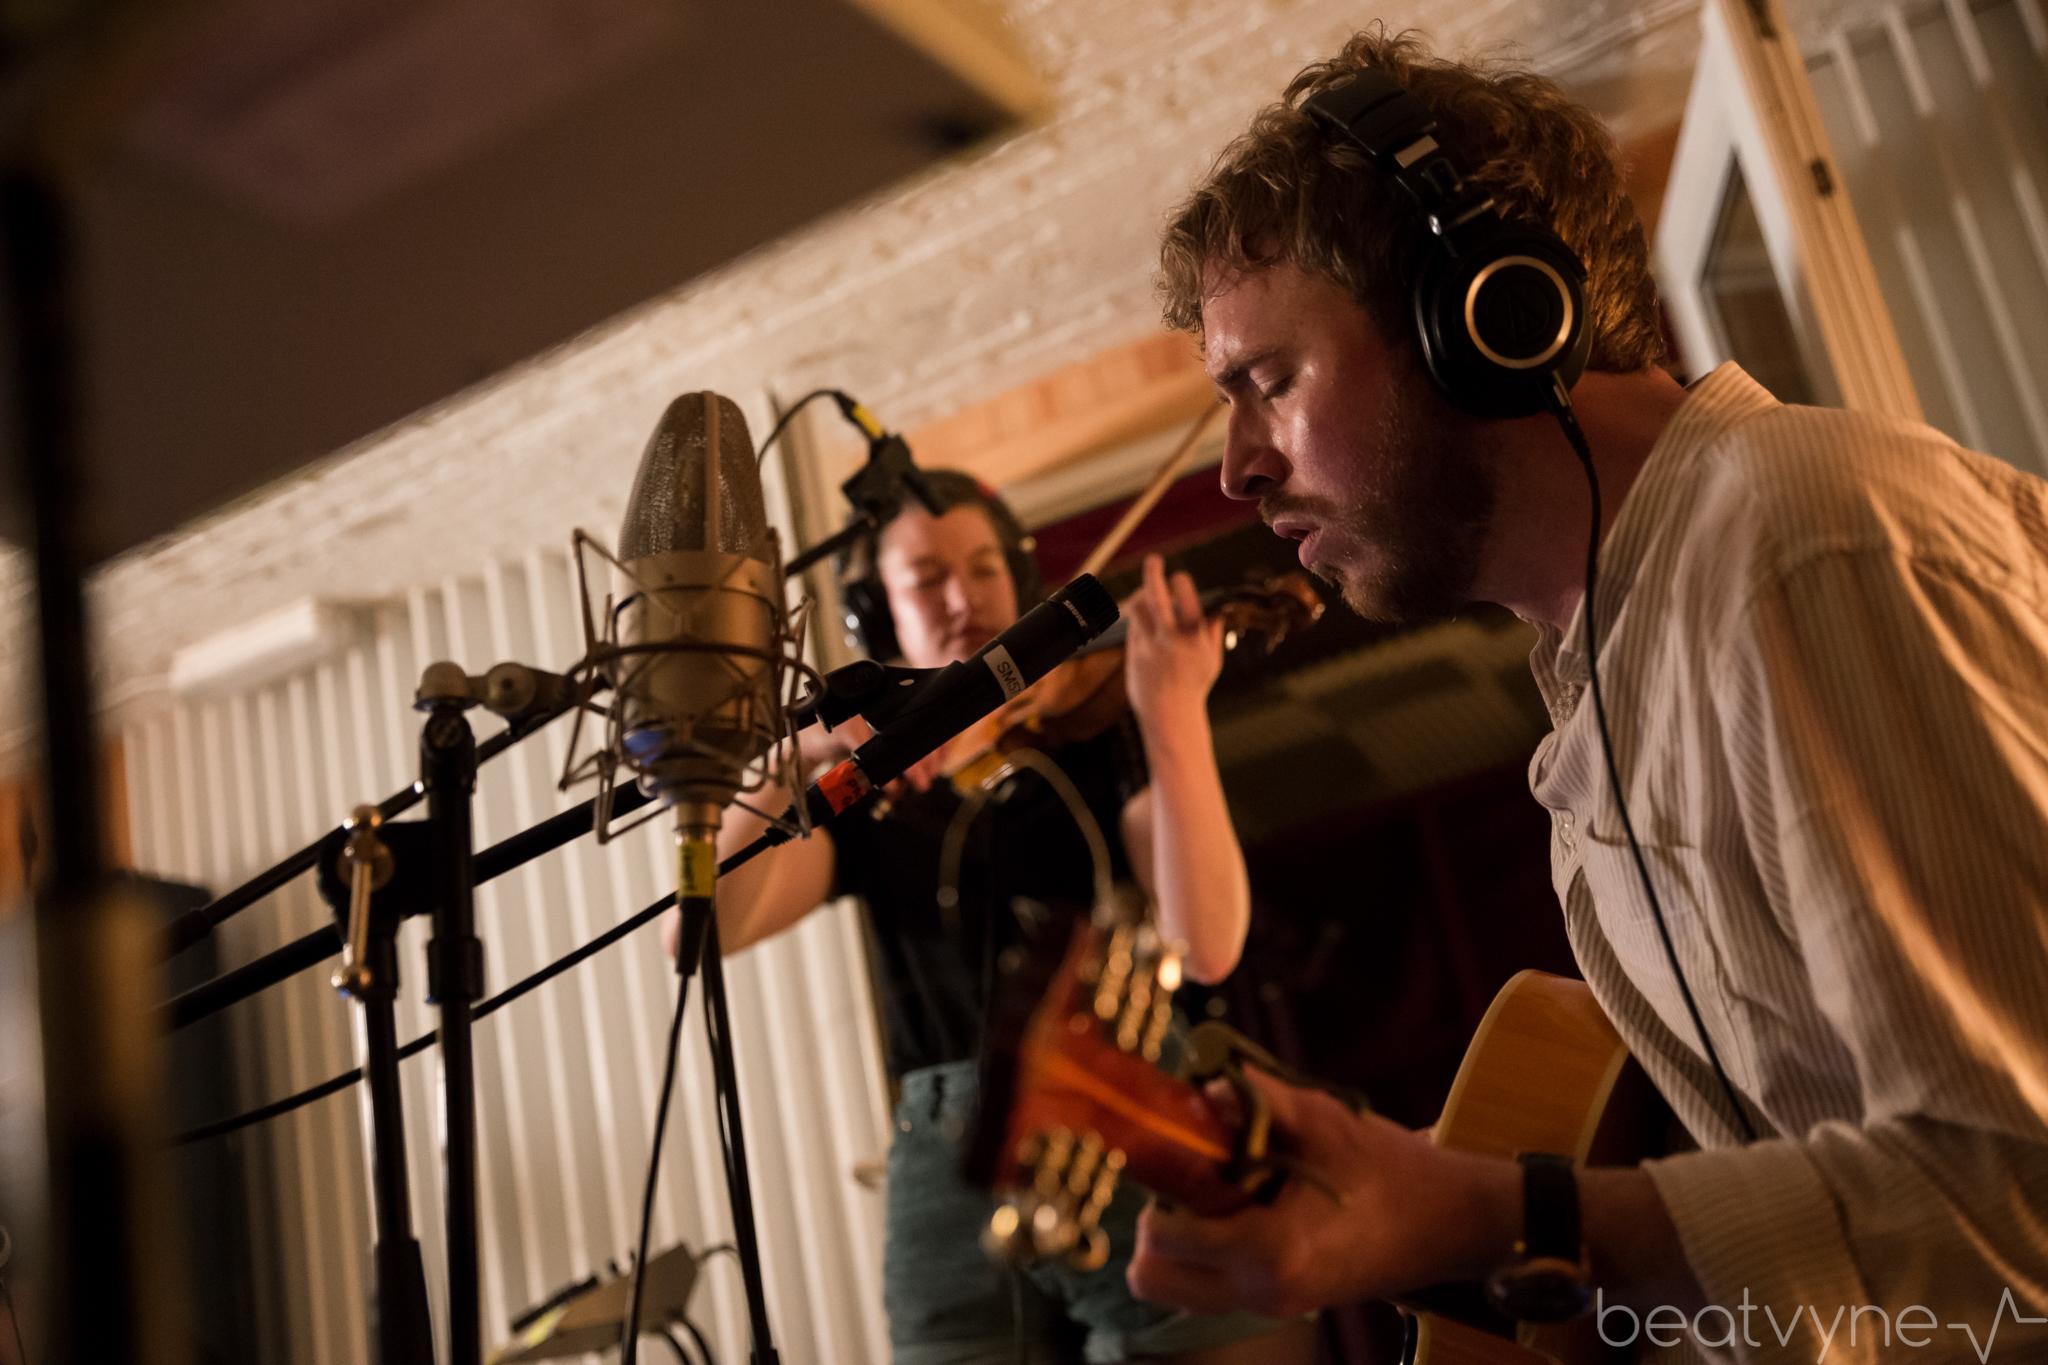 beatvyne's Live Recording Sessions at Sun Studios